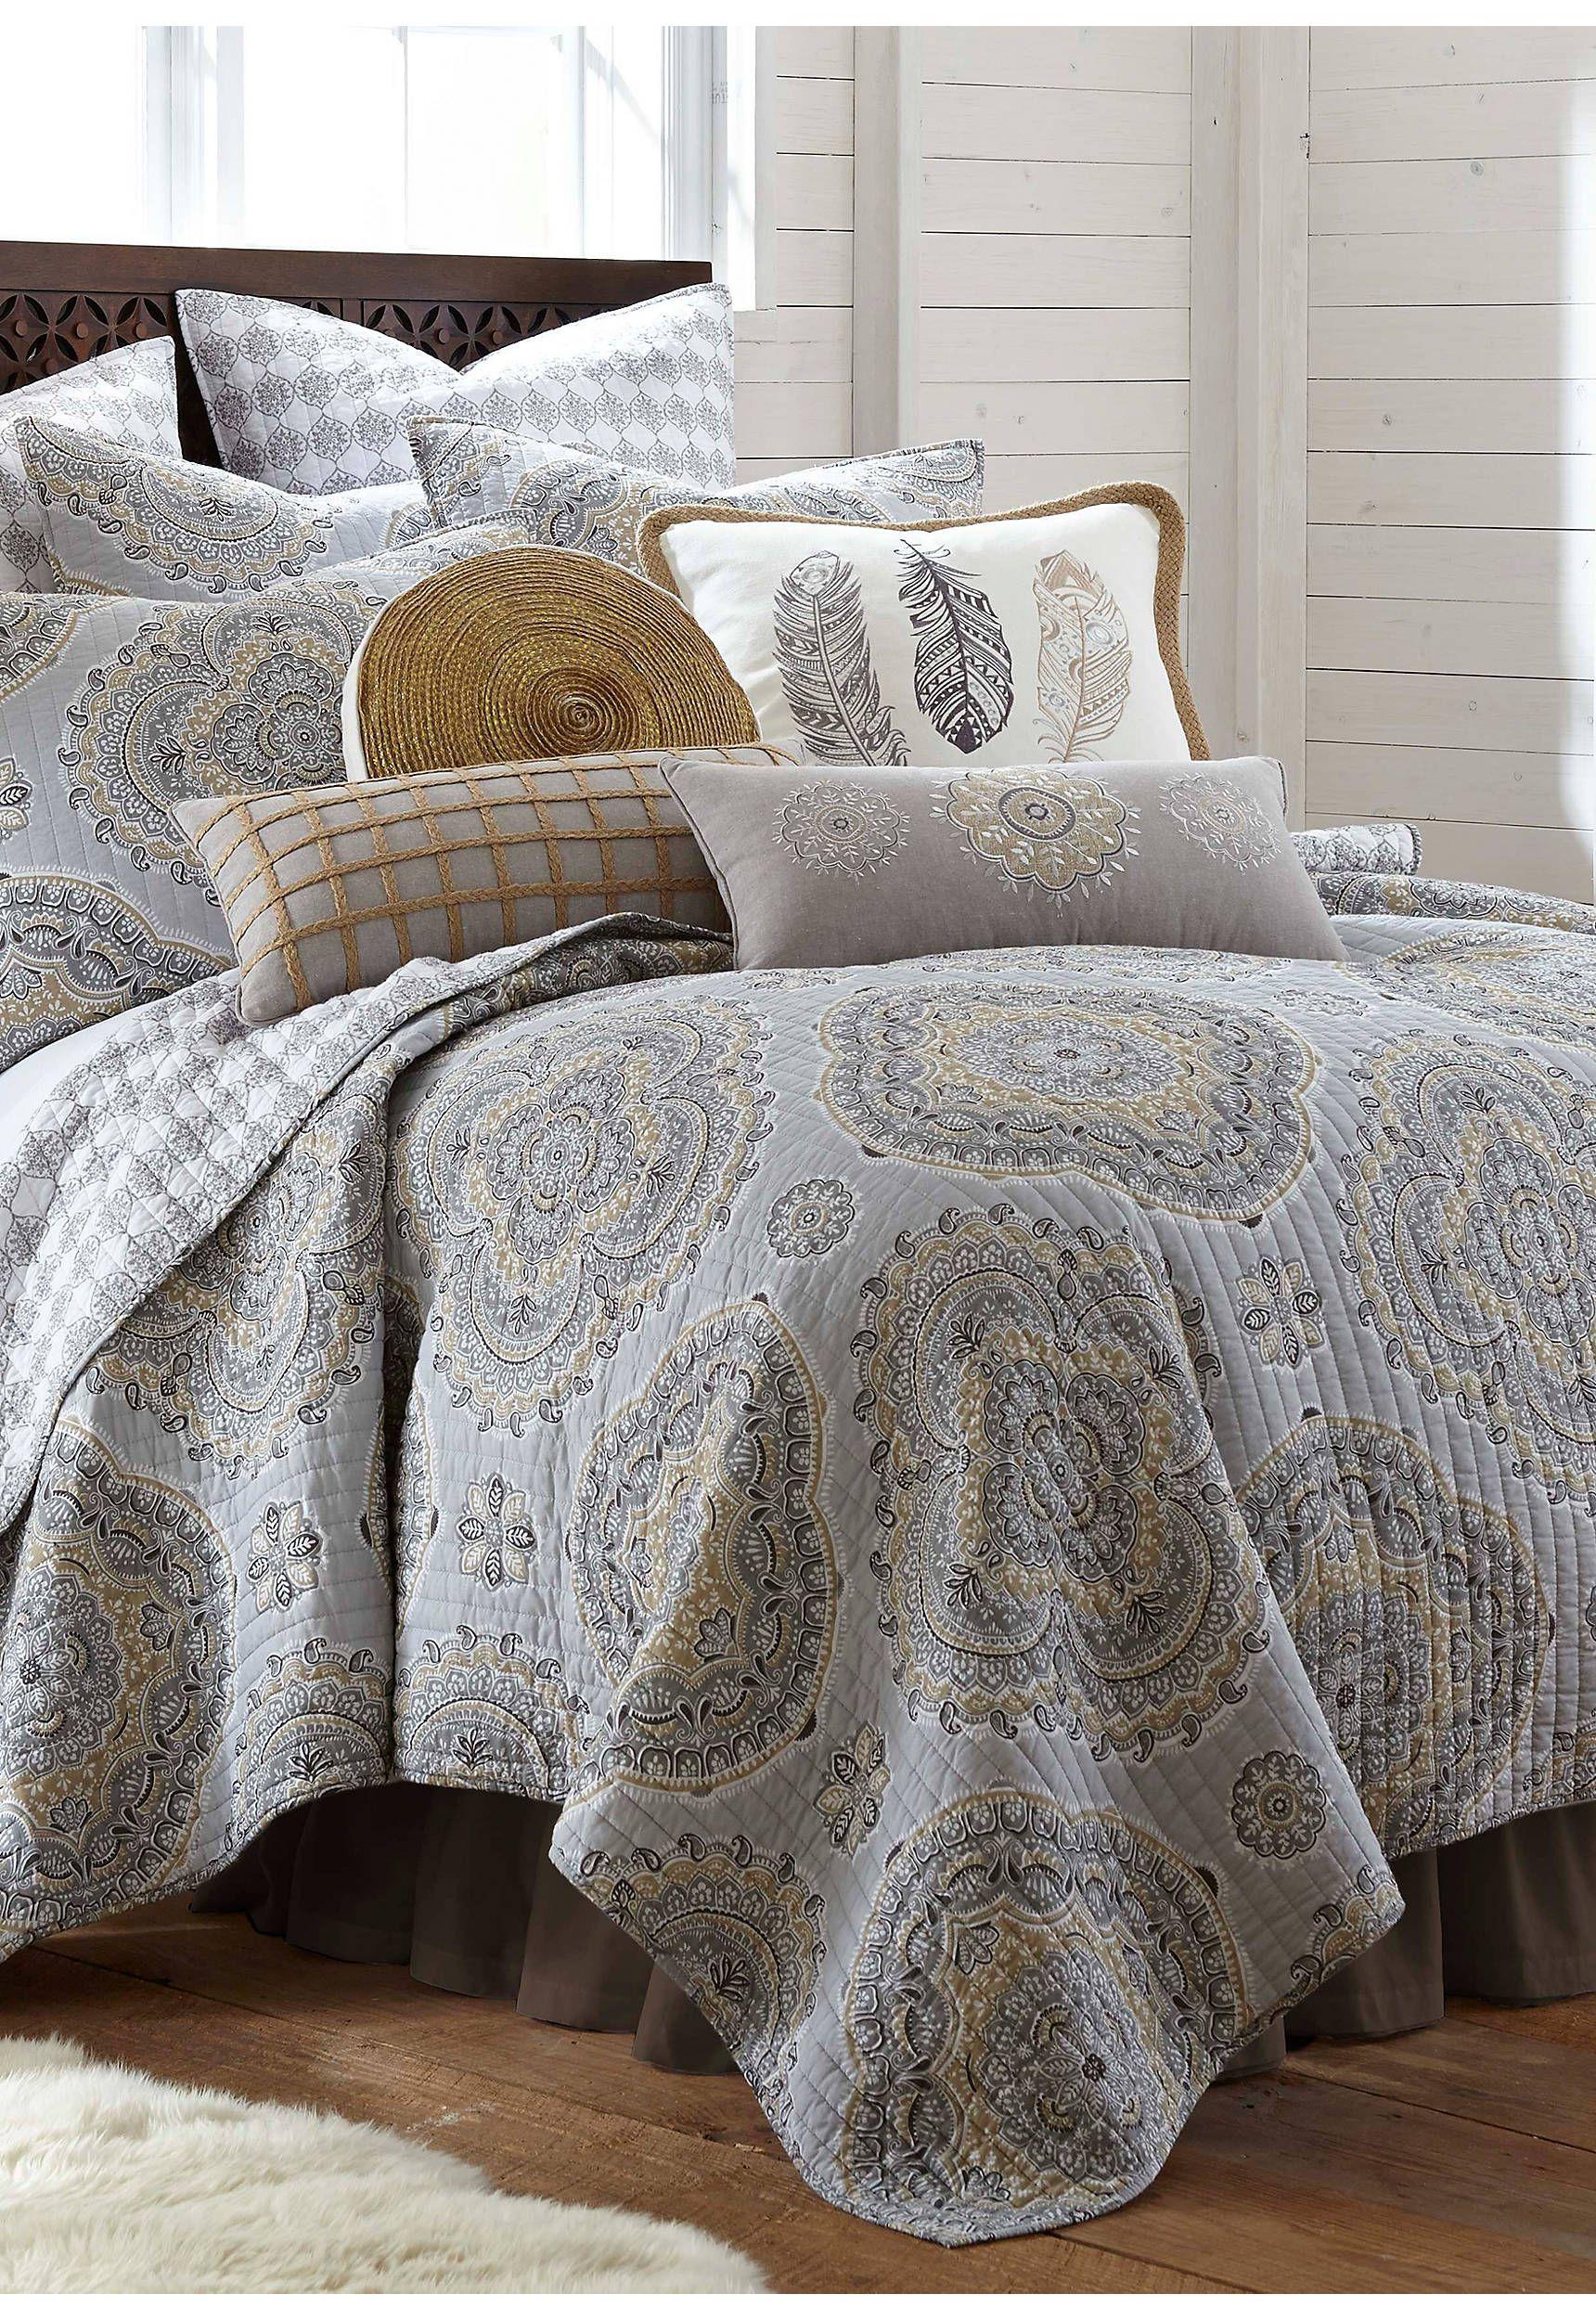 King Bedspreads On Sale.Levtex Zarya Neutral Quilt Set In 2019 Quilt Sets King